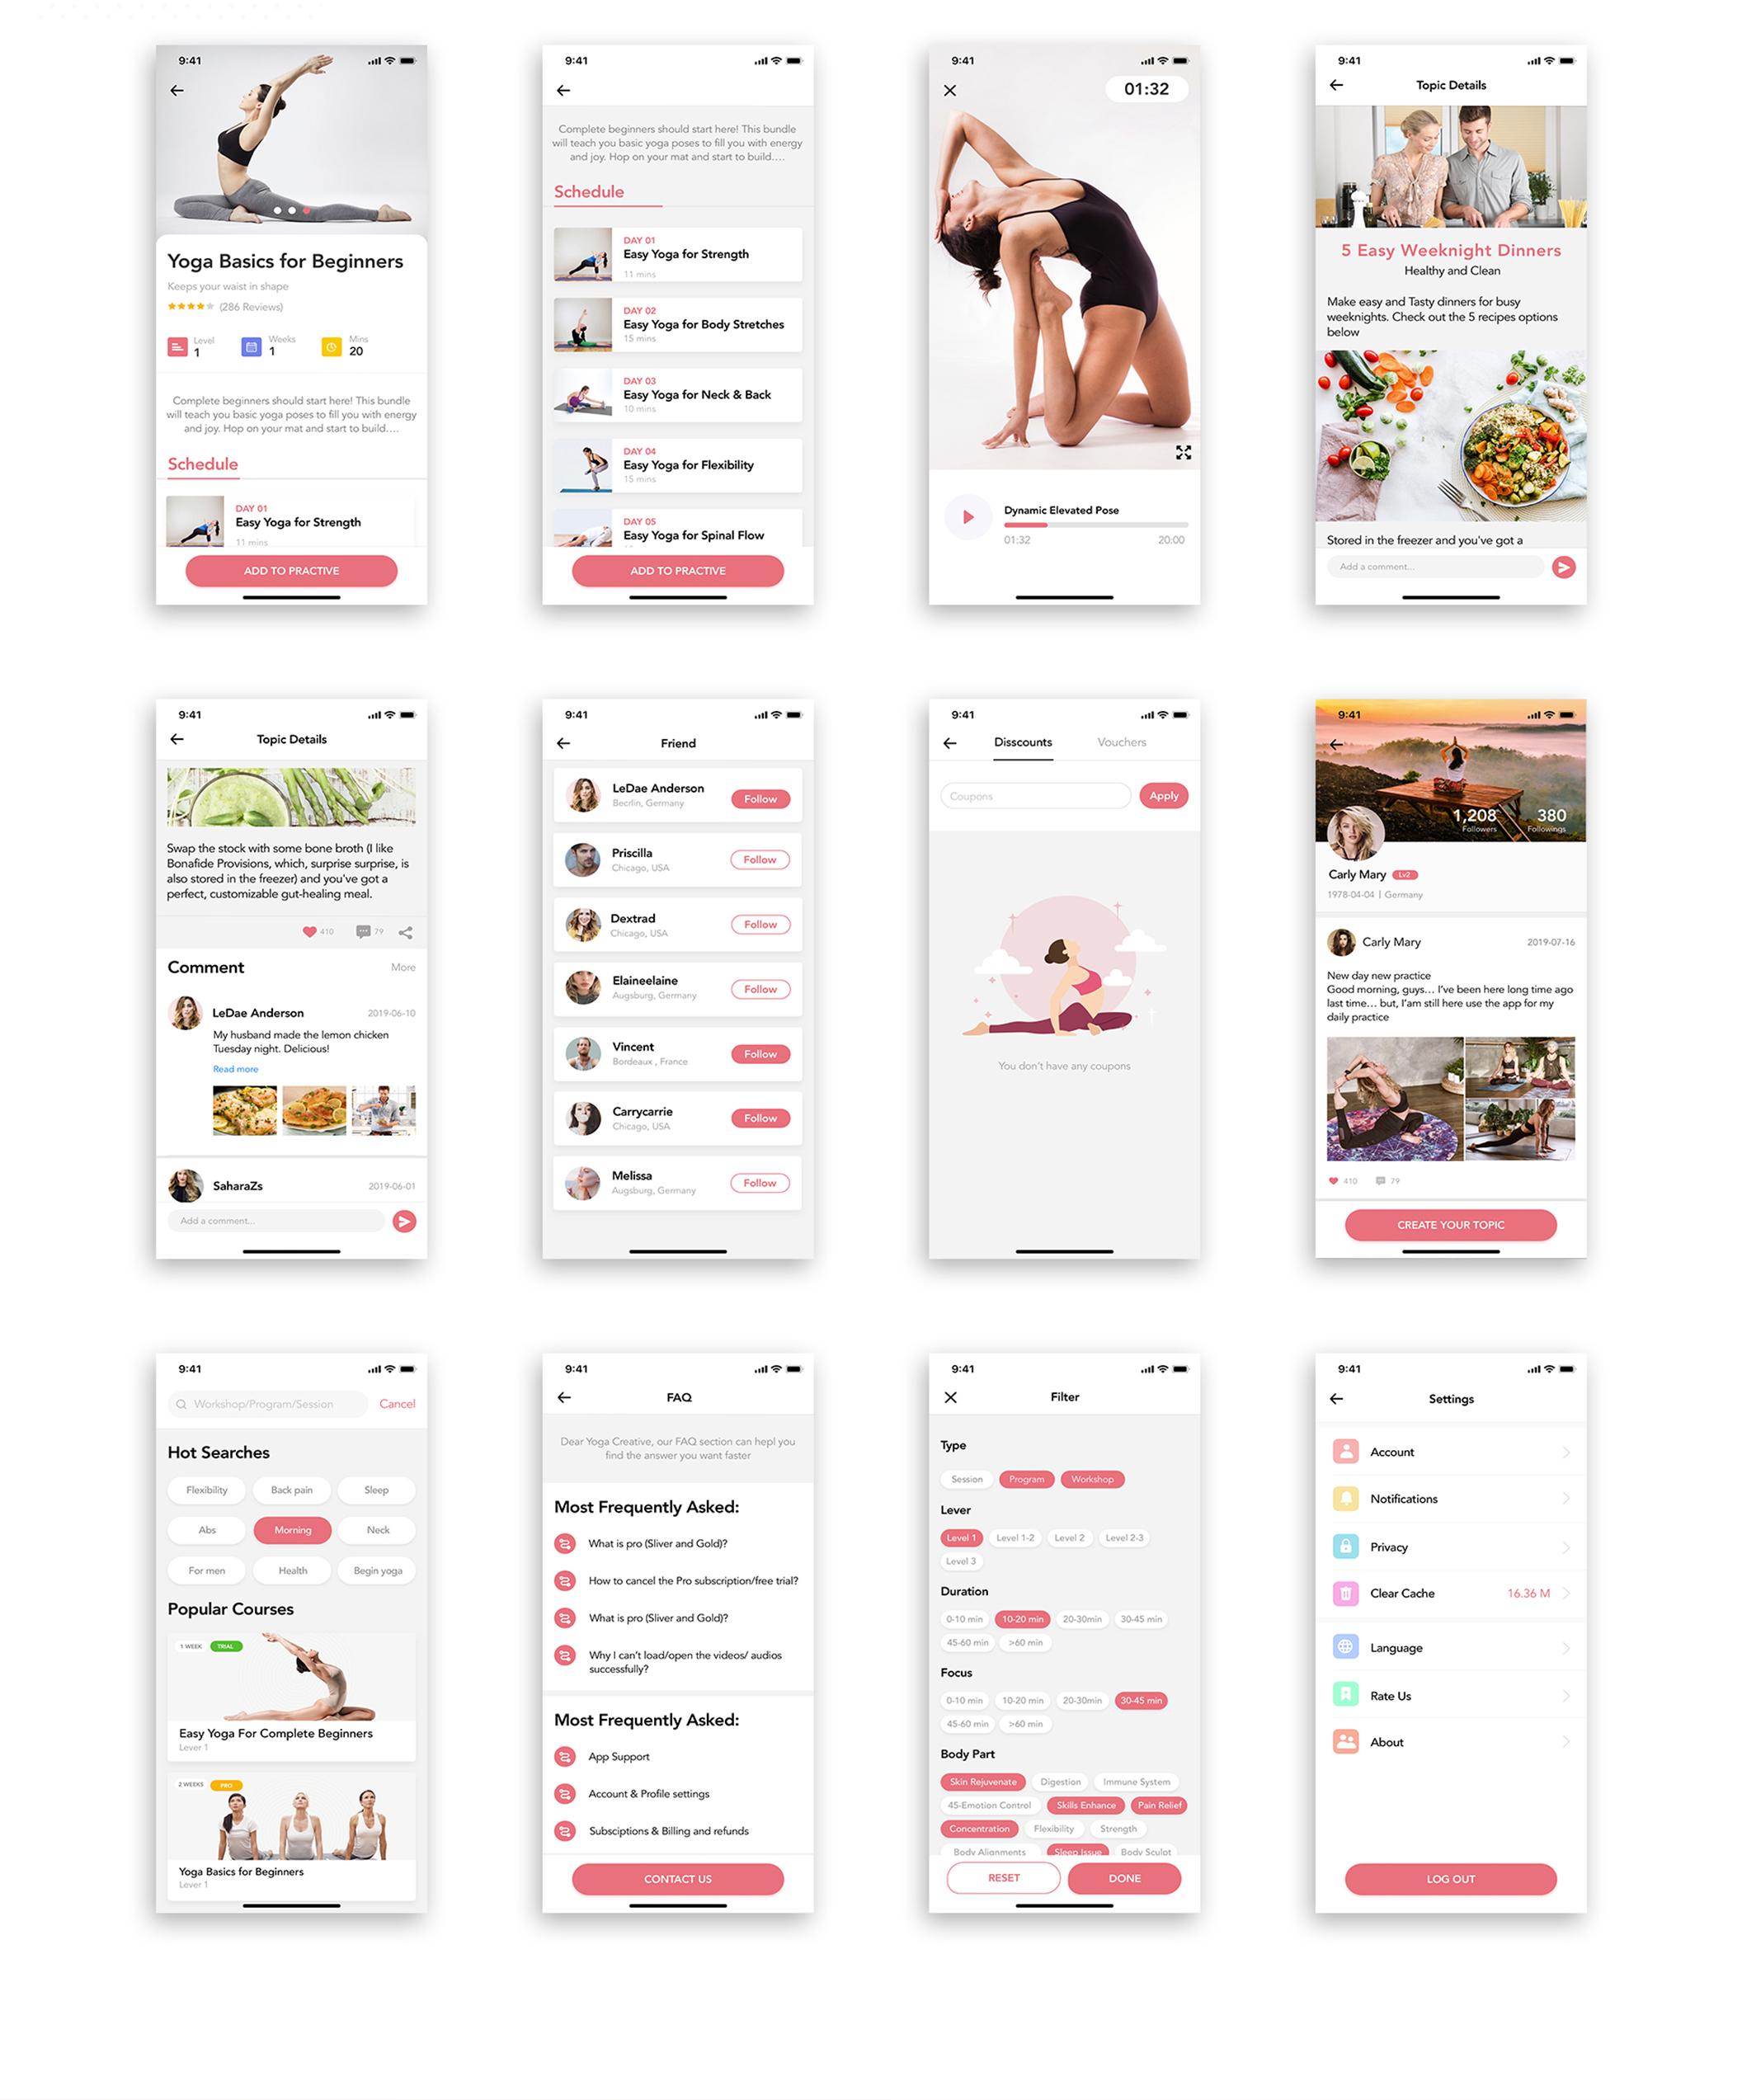 瑜伽健身应用程序APP界面设计UI套件 Yoga Fitness Mobile App UI Kit插图(5)